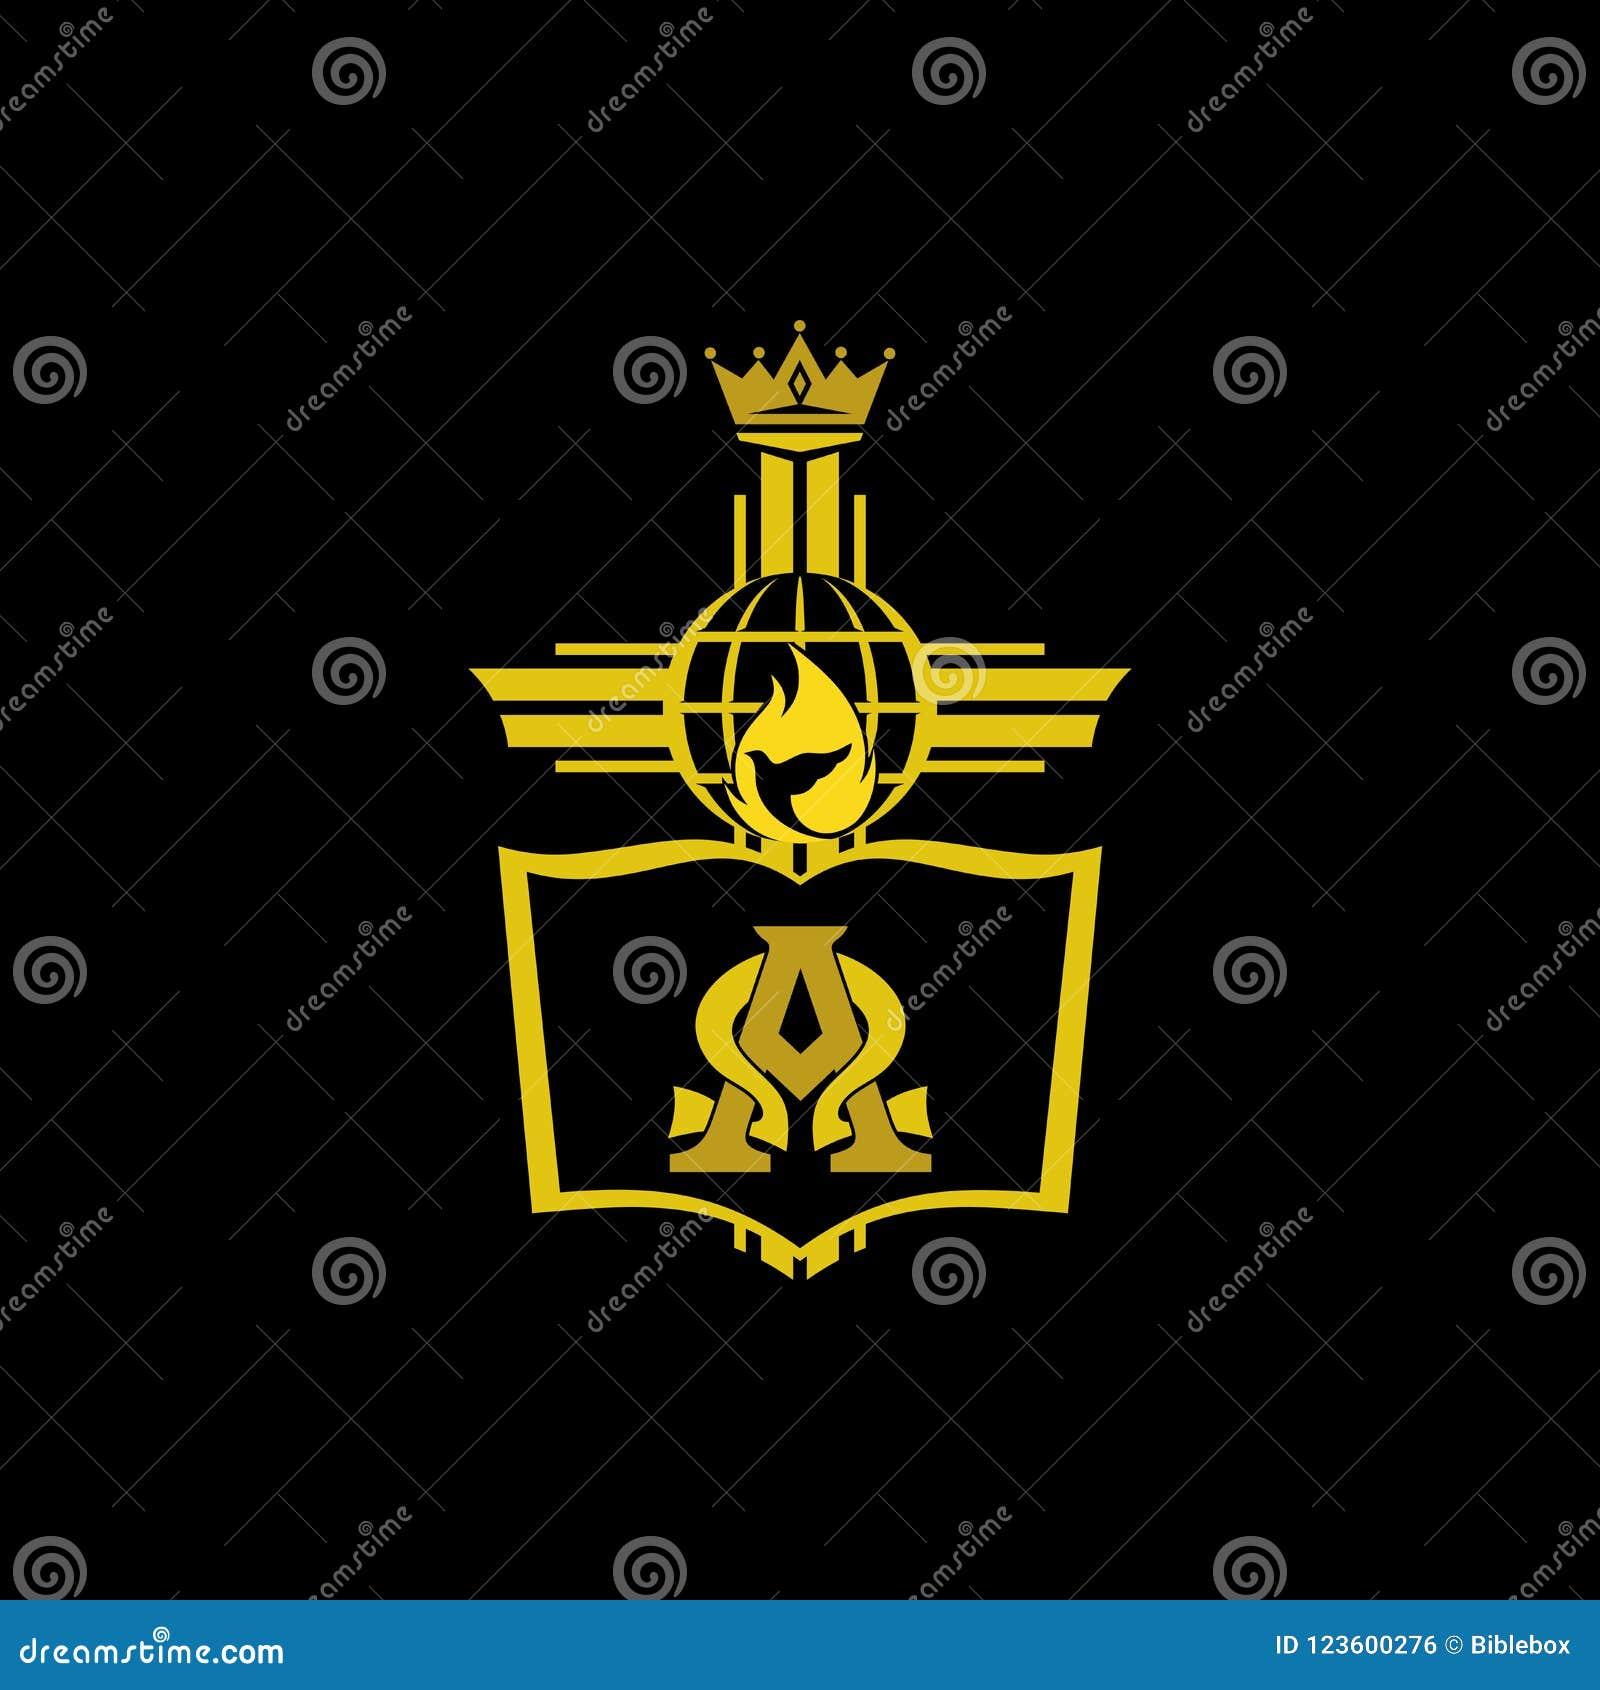 Church Logo Christian Symbols Cross Bible And Symbols Of The